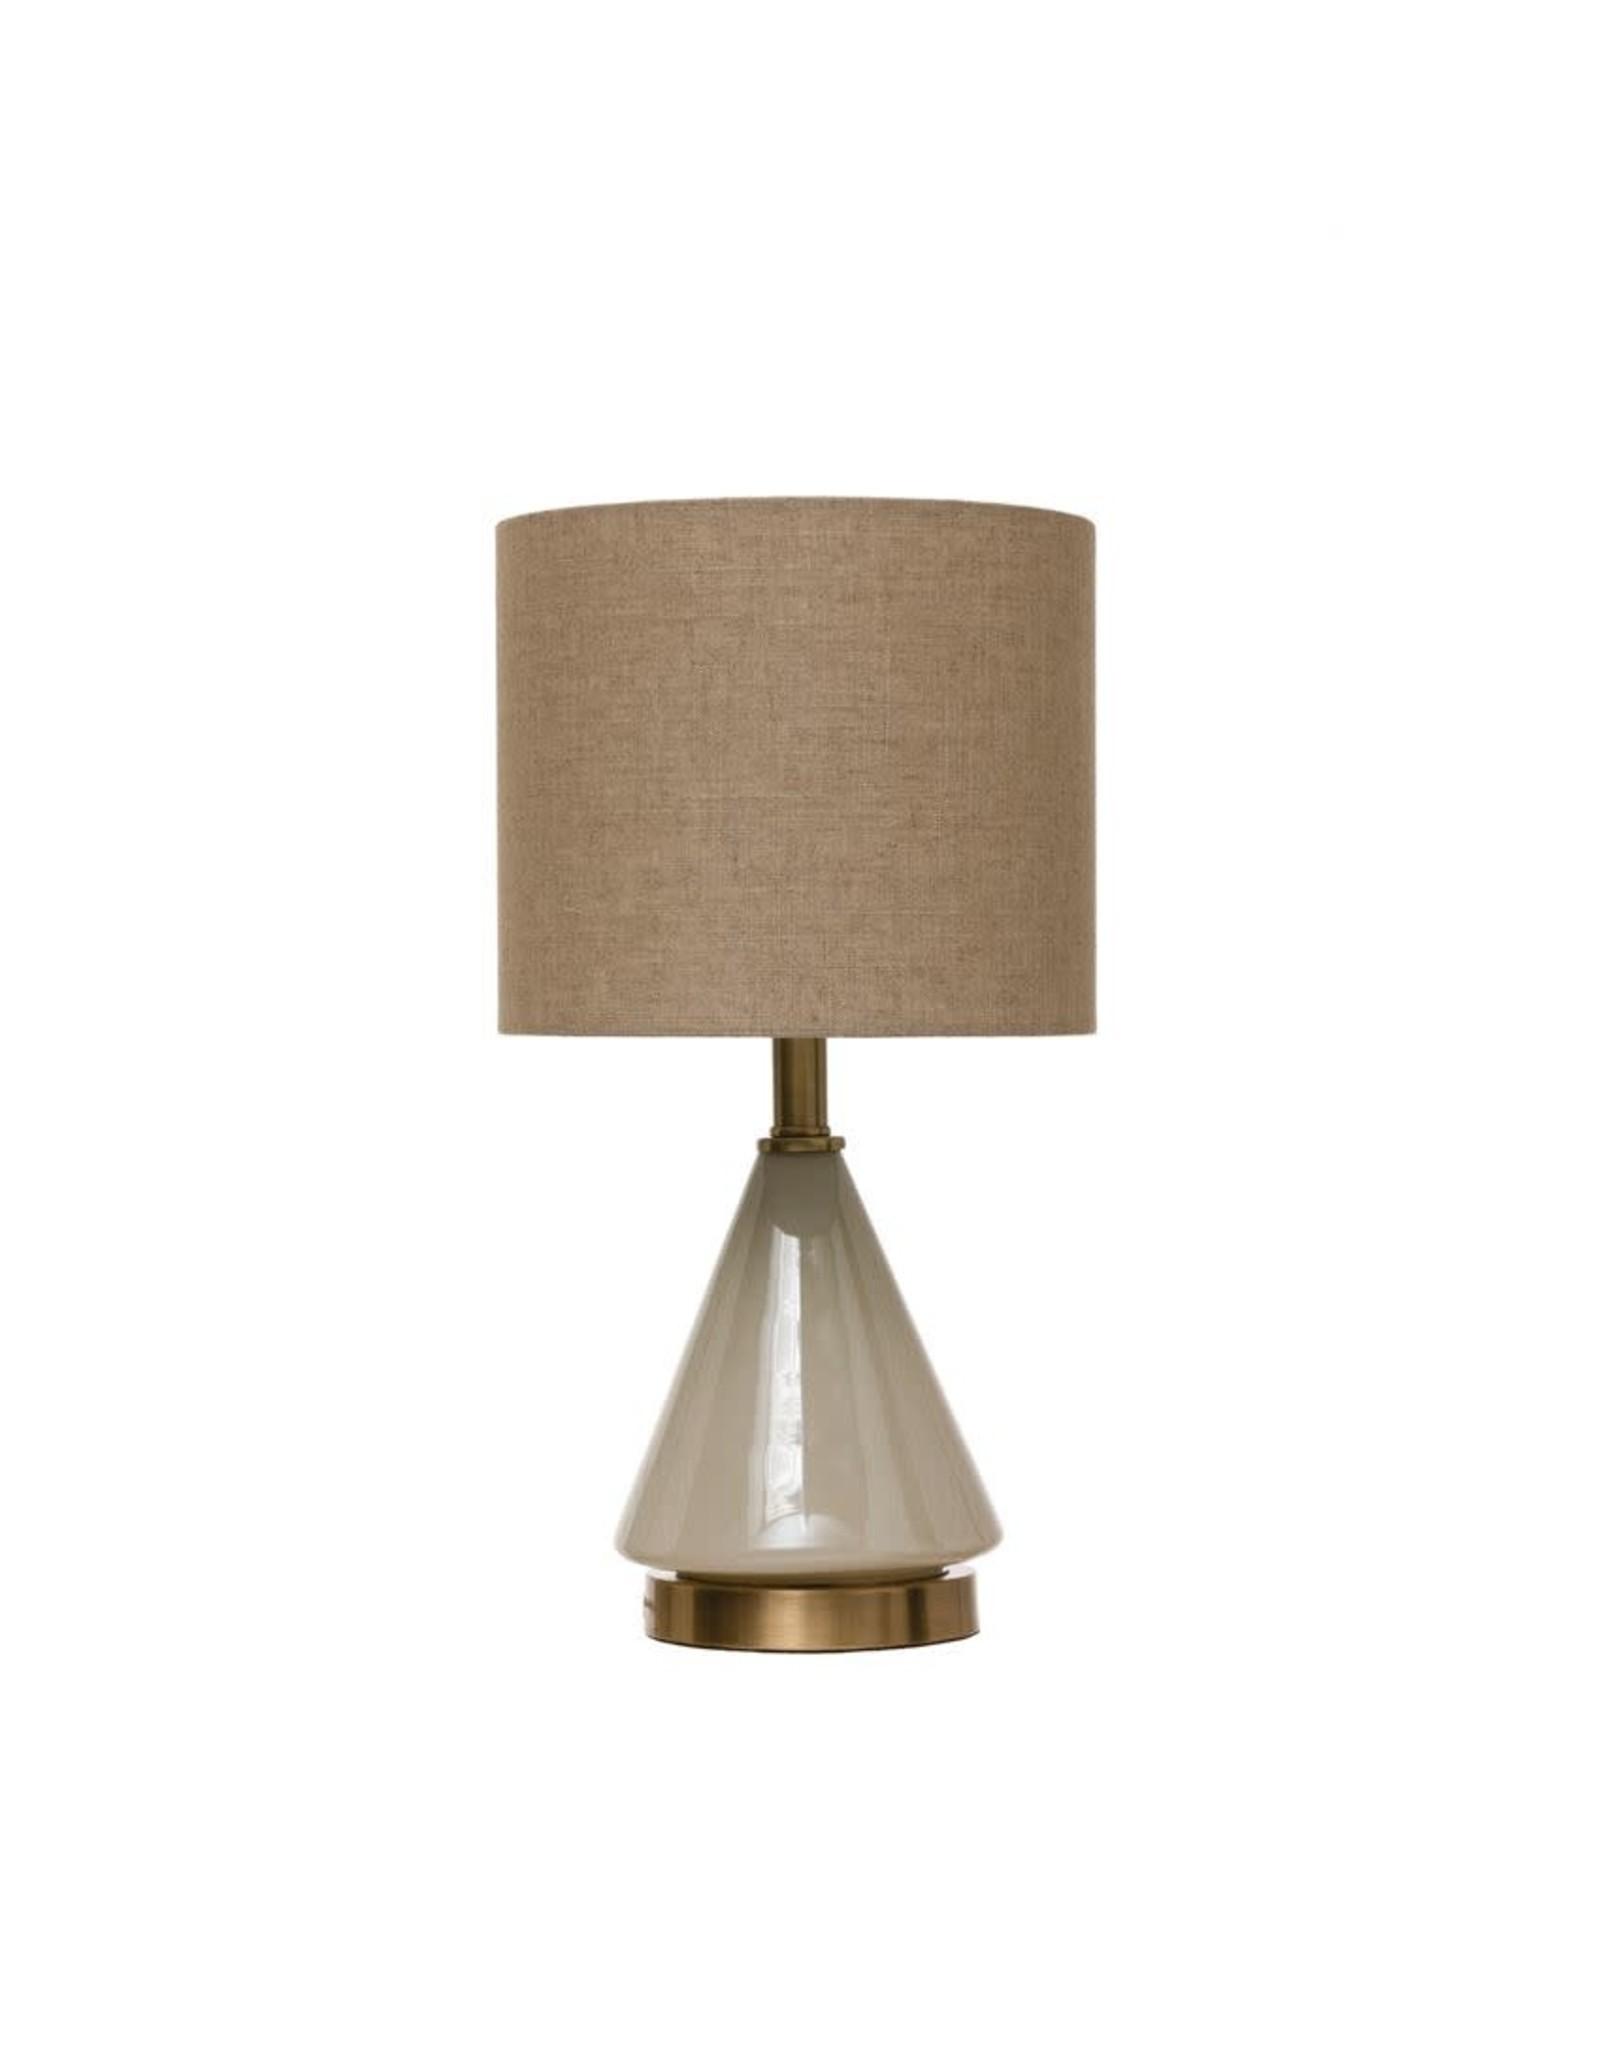 Bloomingville Round Glass Table Lamp - Cream